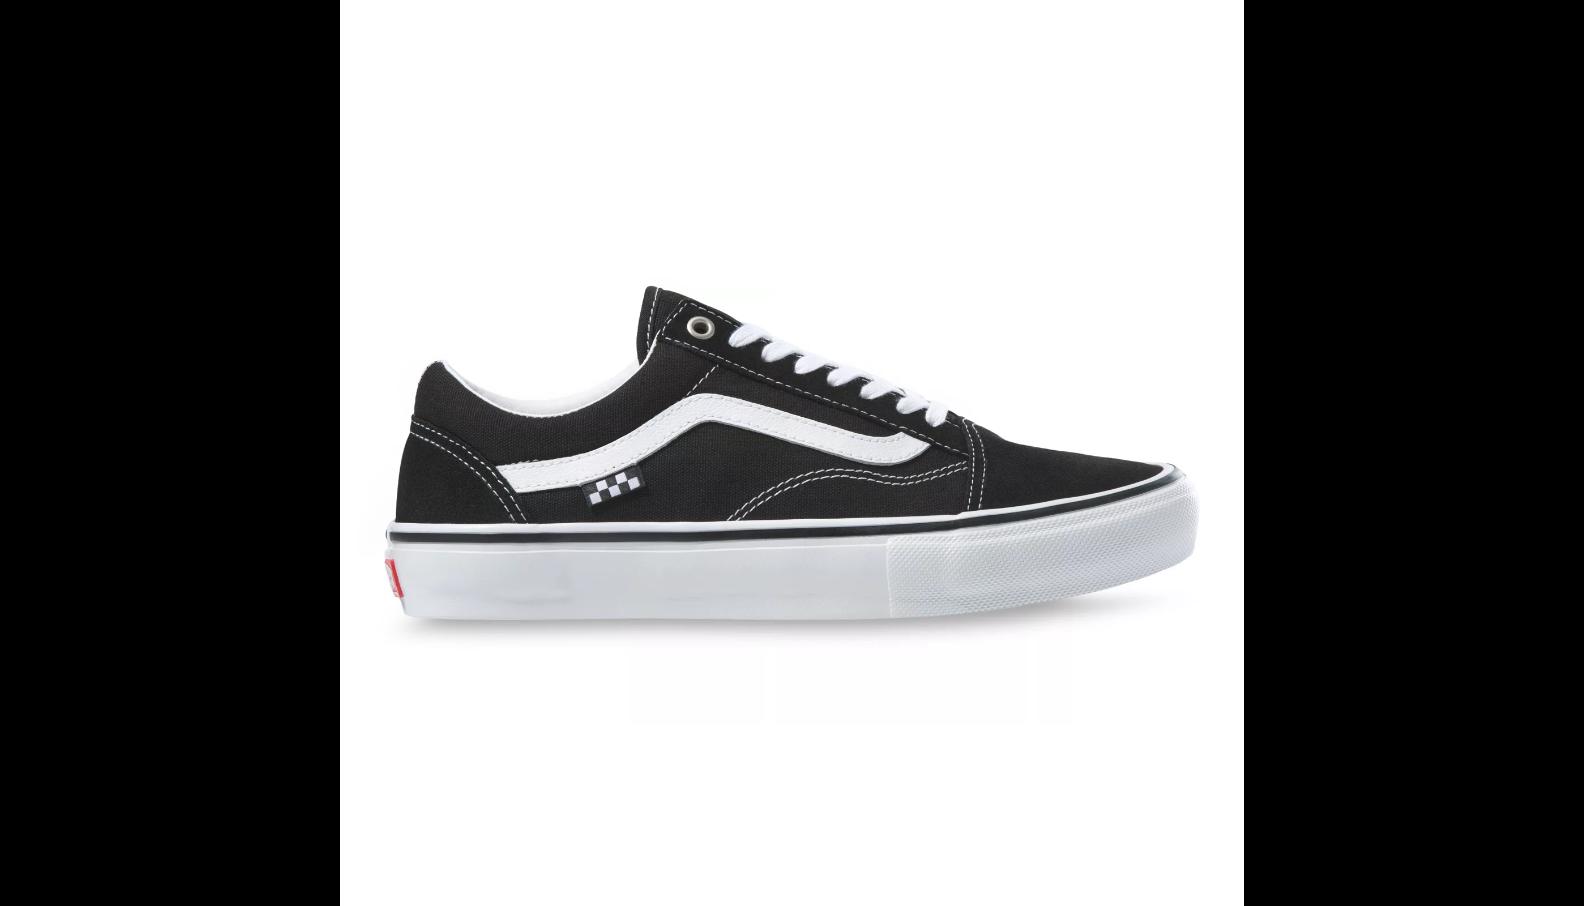 Vans Skate Old Skool - Black/ White